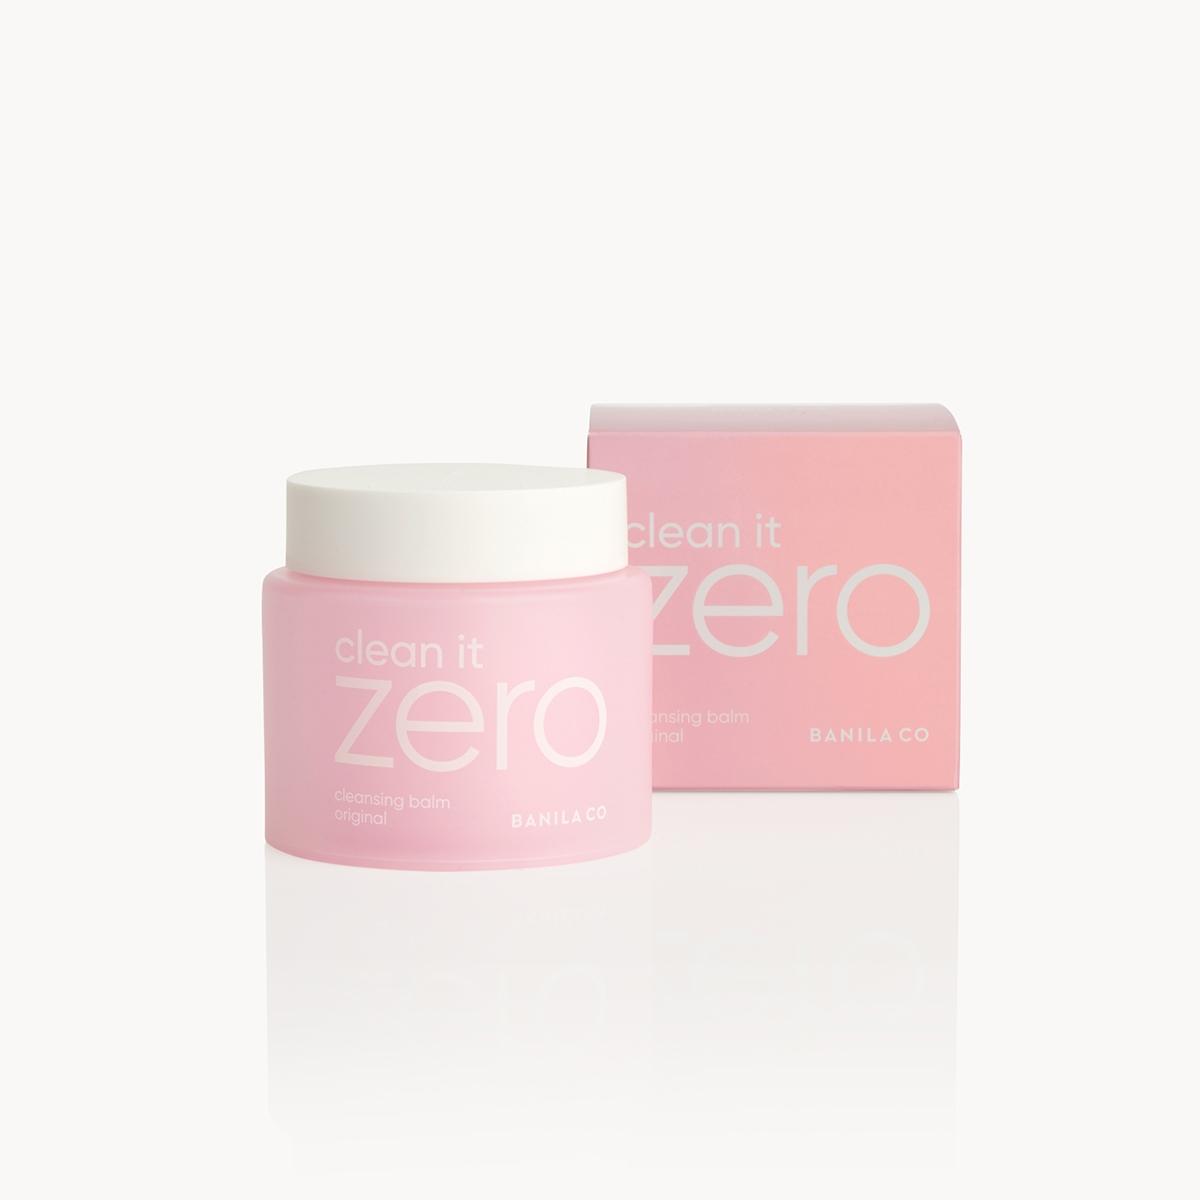 BANILA CO Clean It Zero Cleansing Balm 180 ml Original